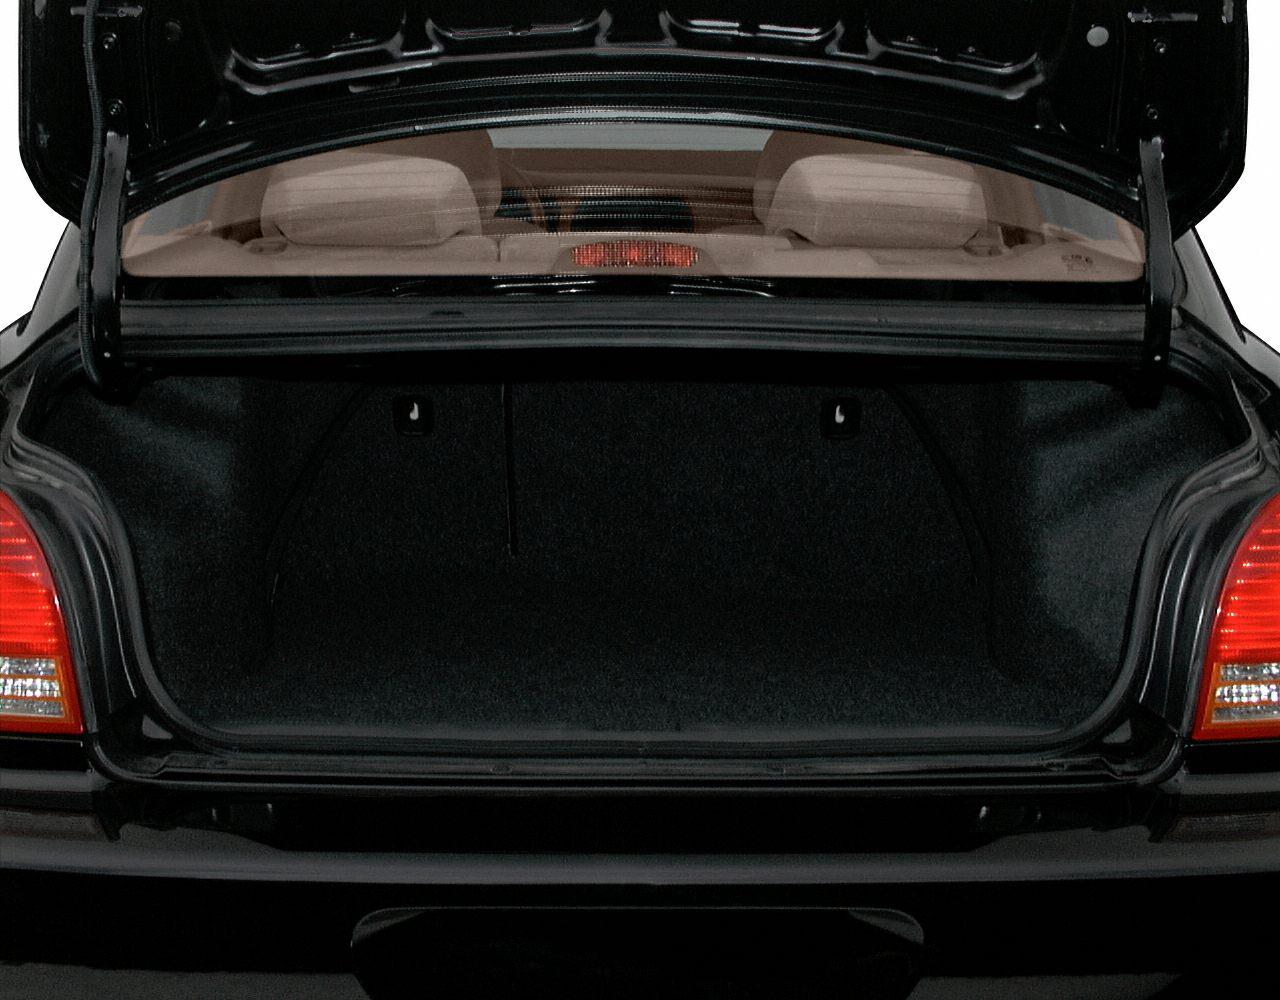 2000 Hyundai Sonata Exterior Photo